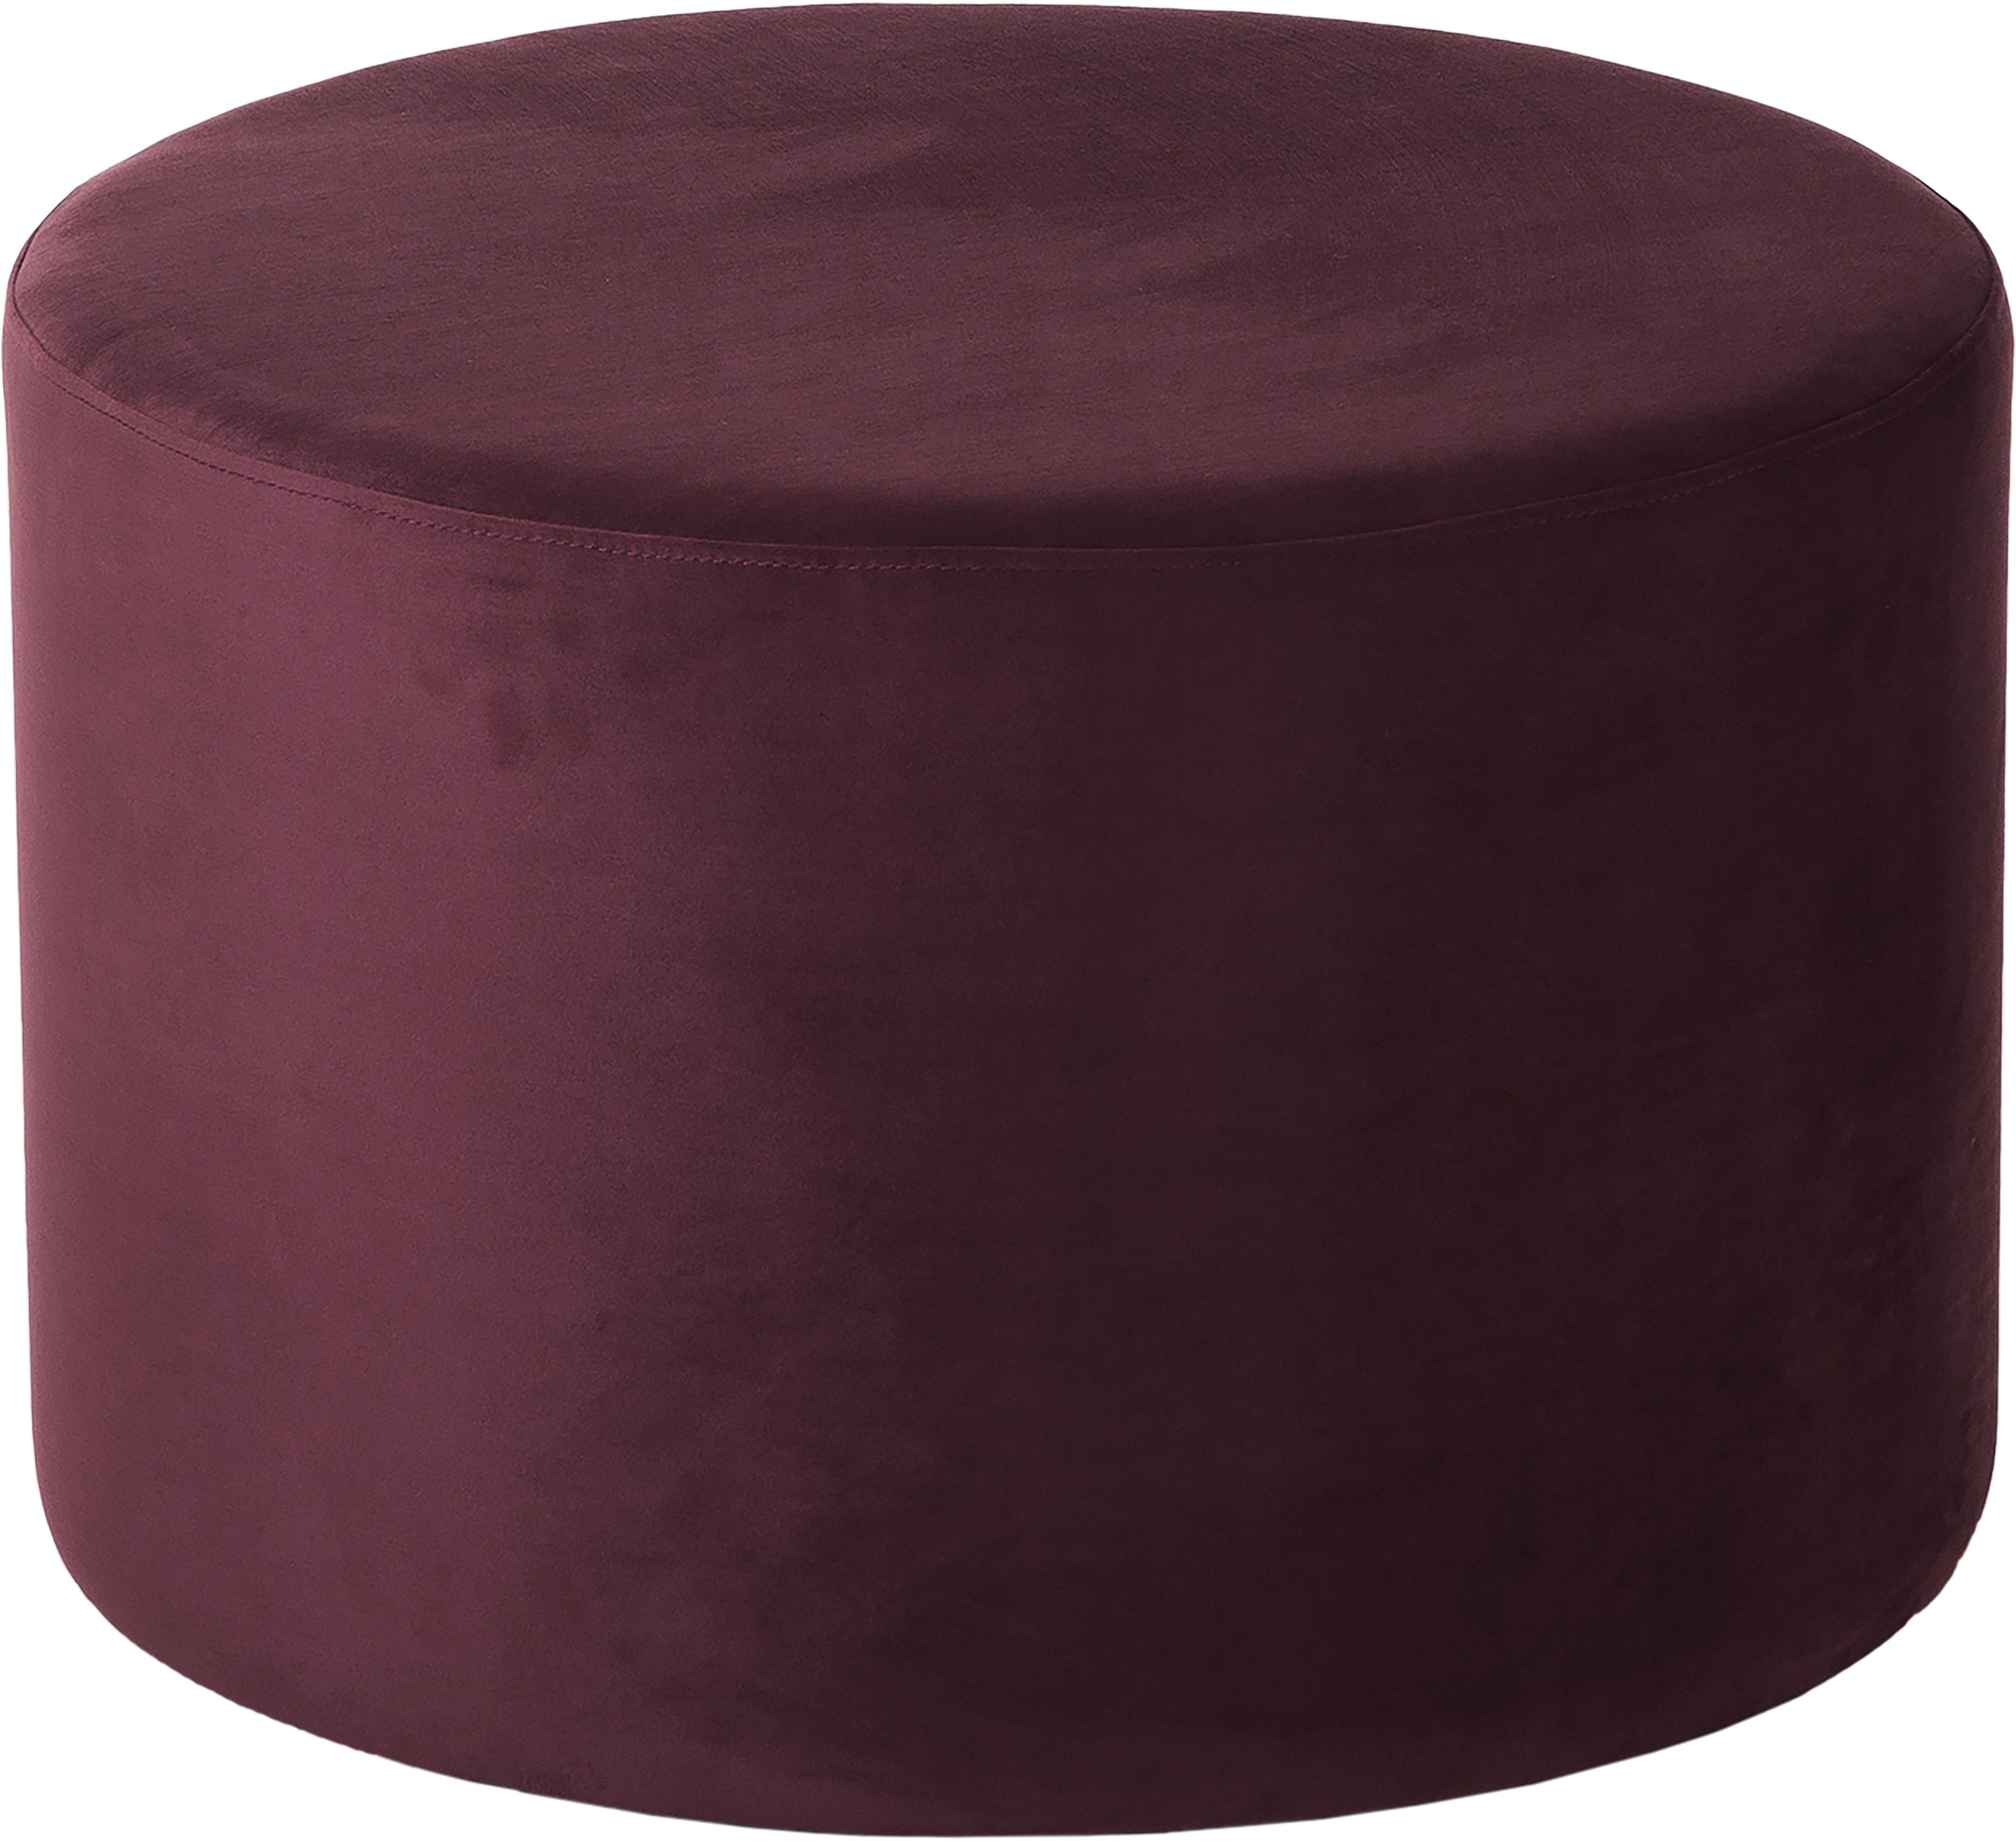 Samt-Hocker Daisy, Bezug: Samt (Polyester) 15.000 S, Rahmen: Mitteldichte Holzfaserpla, Samt Dunkelrot, Ø 54 x H 40 cm